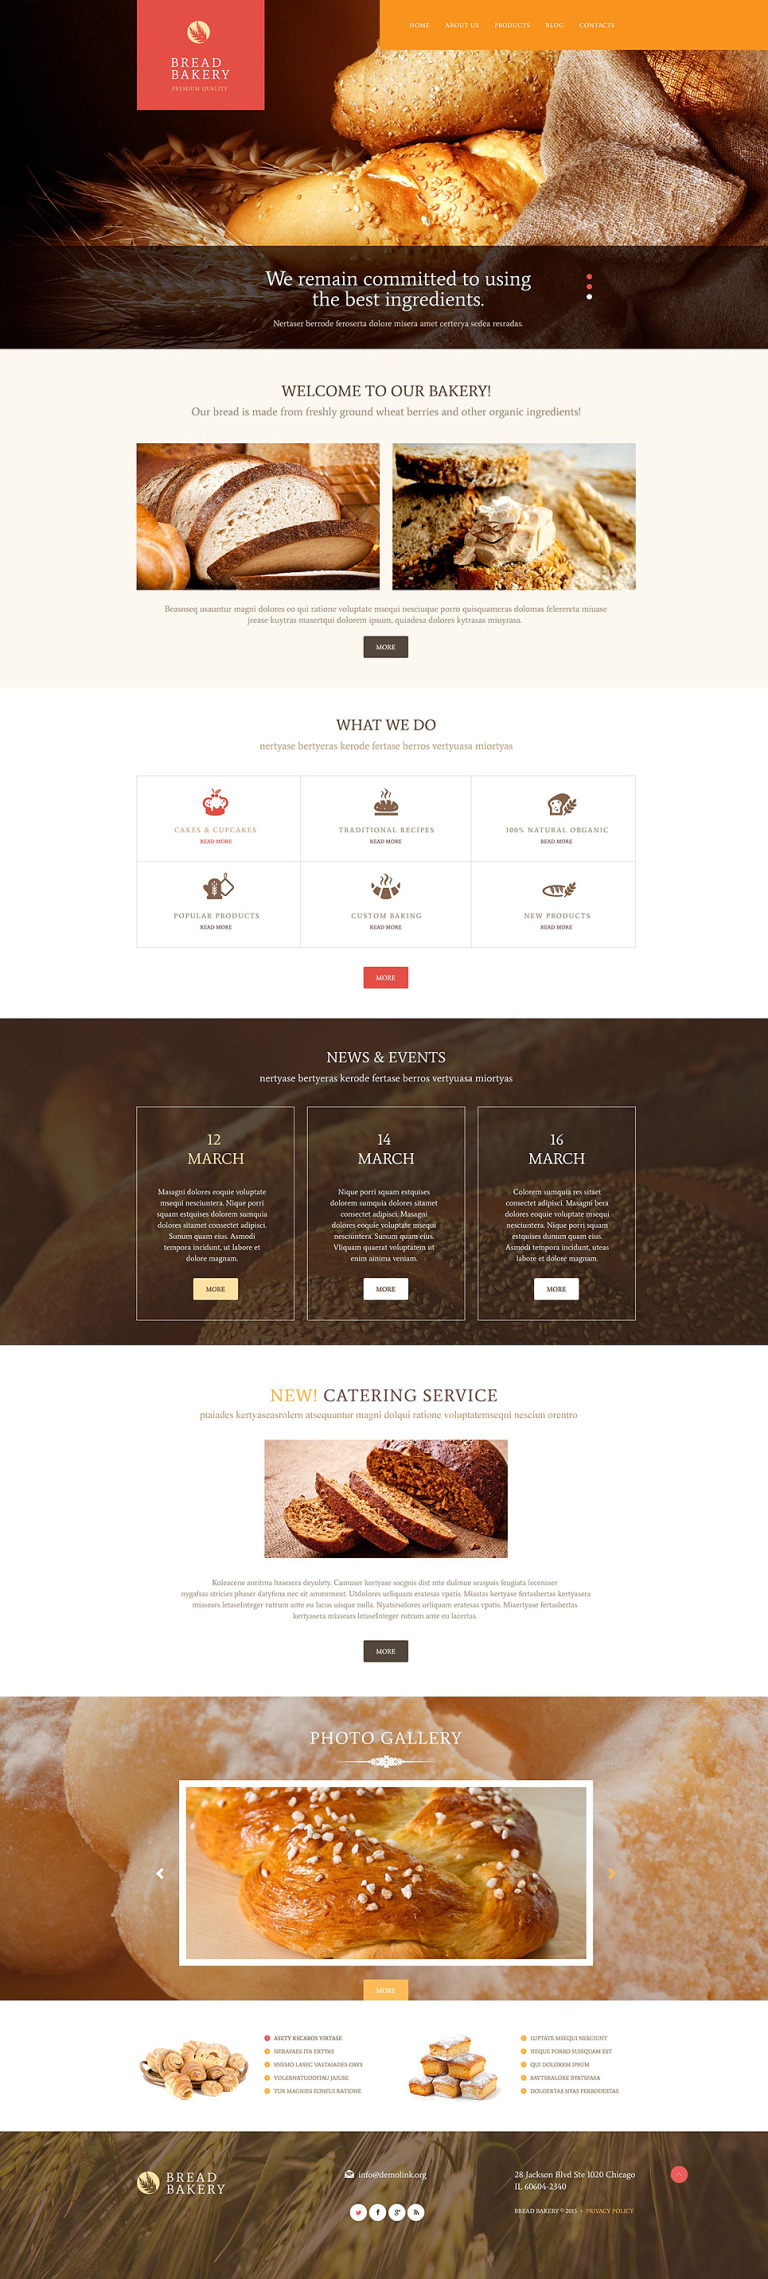 Pastries WordPress Theme New Screenshots BIG